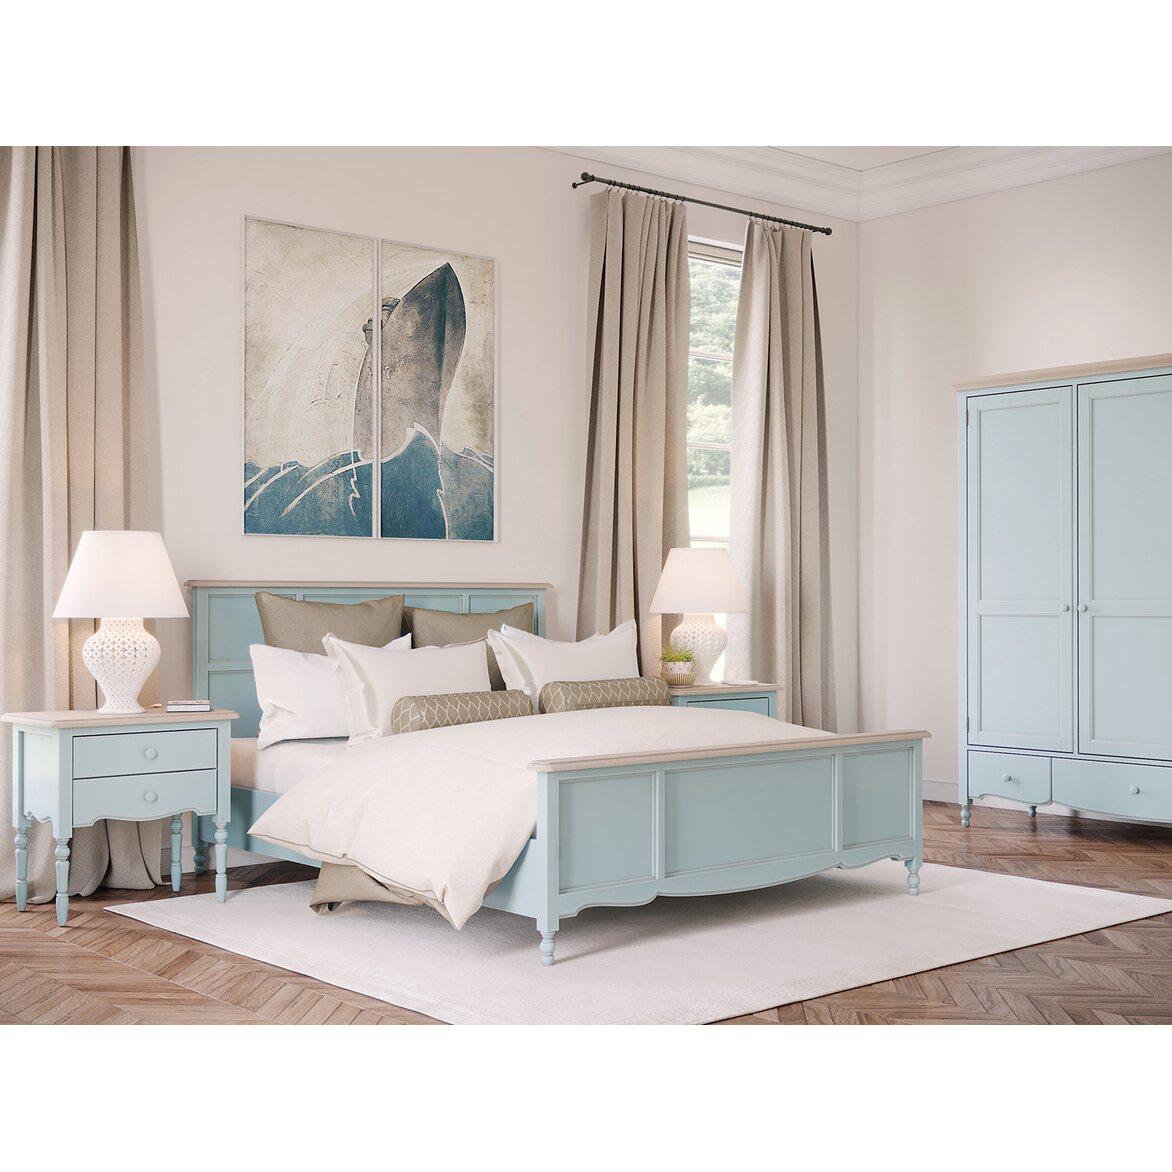 Шкаф трехстворчатый Leblanc, голубой 4   Платяные шкафы Kingsby